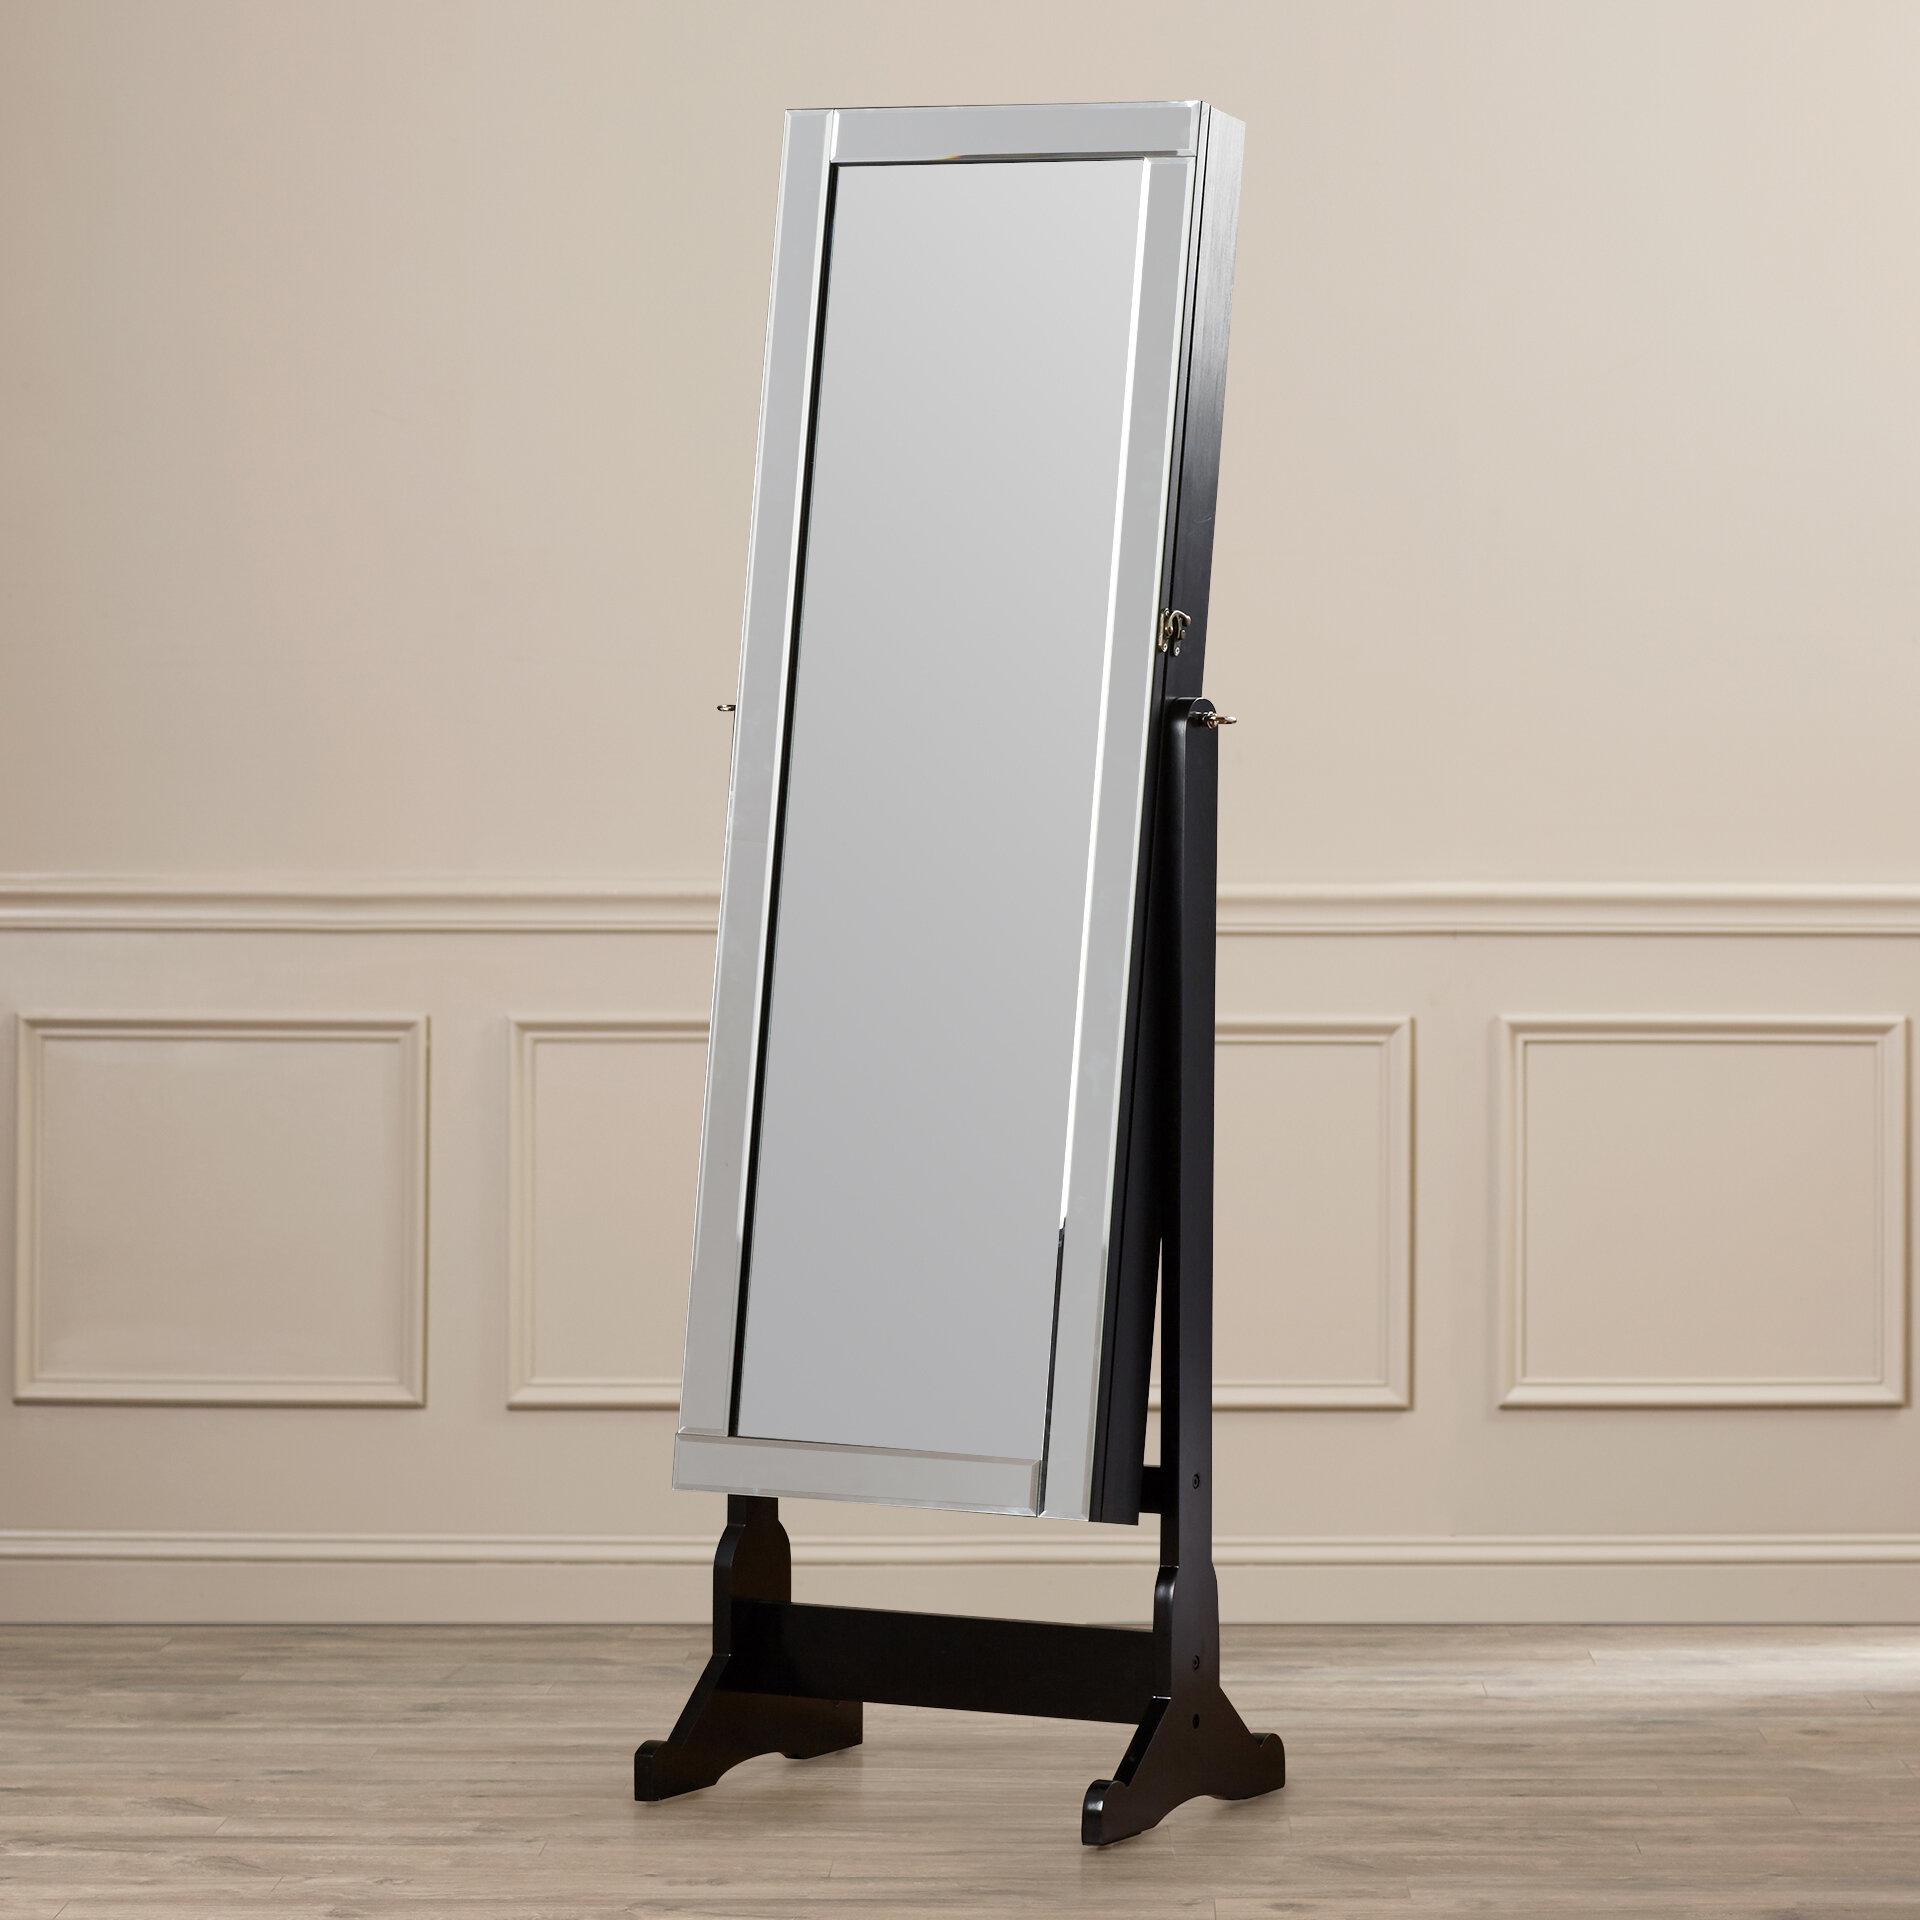 Willa Arlo Interiors Bristol Rectangle Cheval Mirror & Reviews   Wayfair